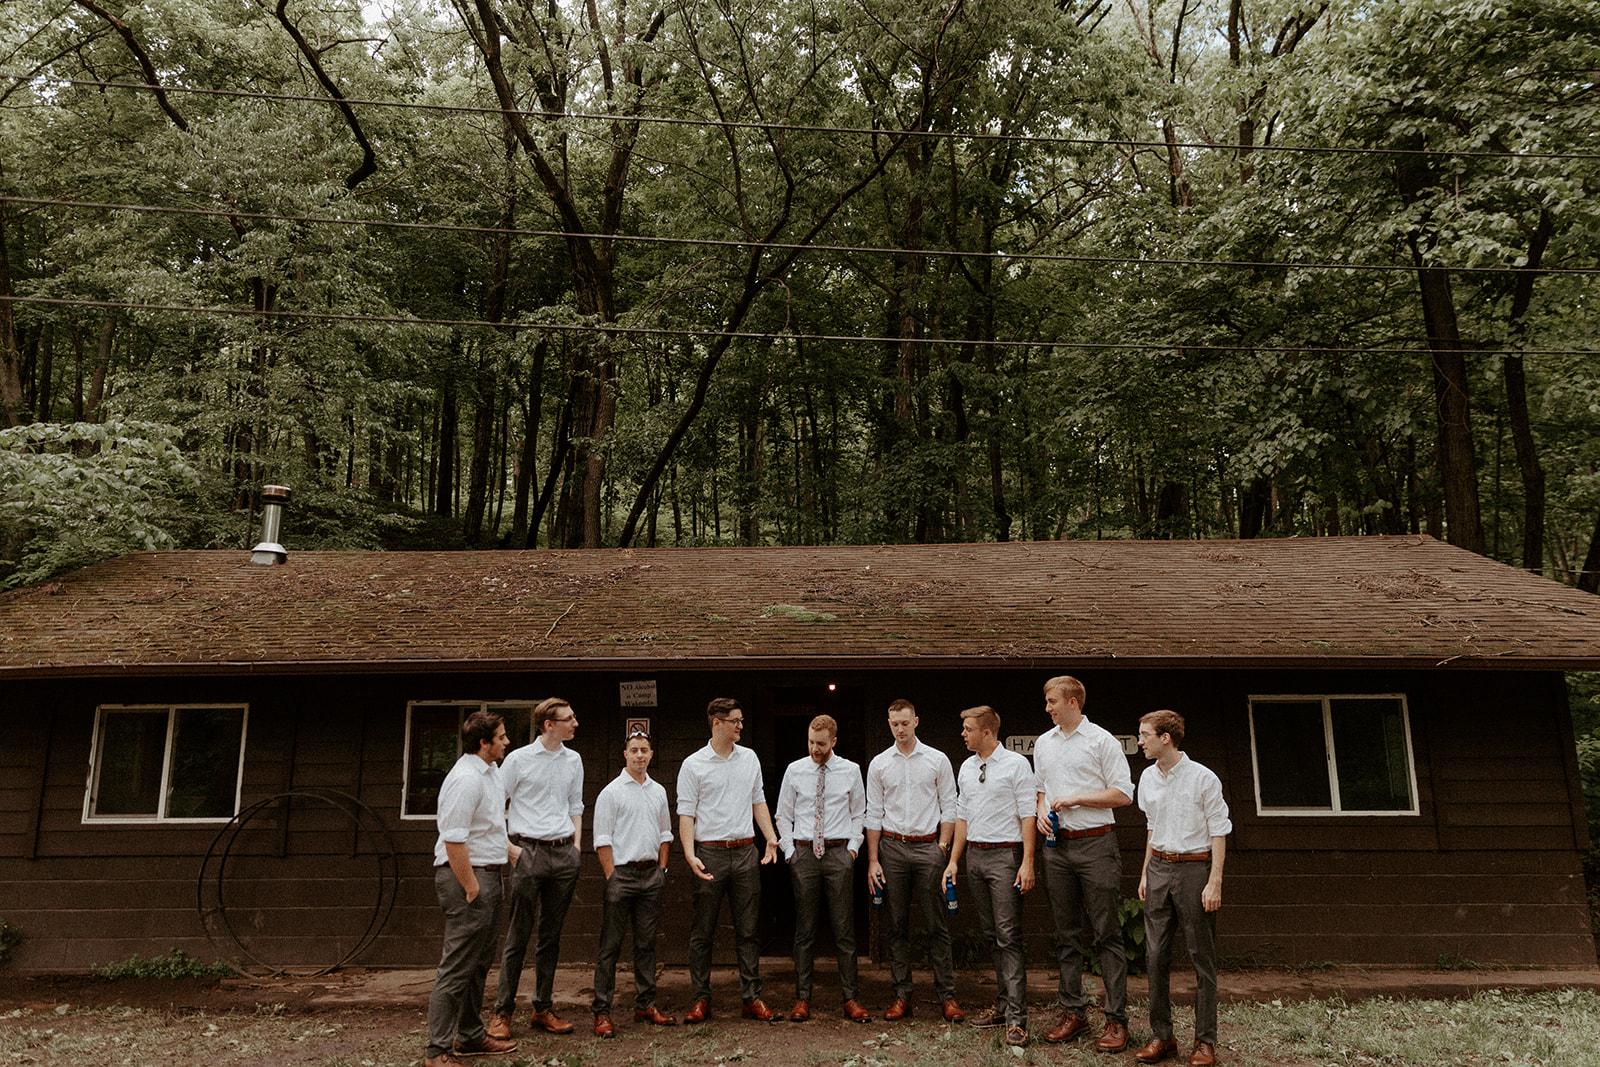 camp_wokanda_peoria_illinois_wedding_photographer_wright_photographs_bliese_0135.jpg